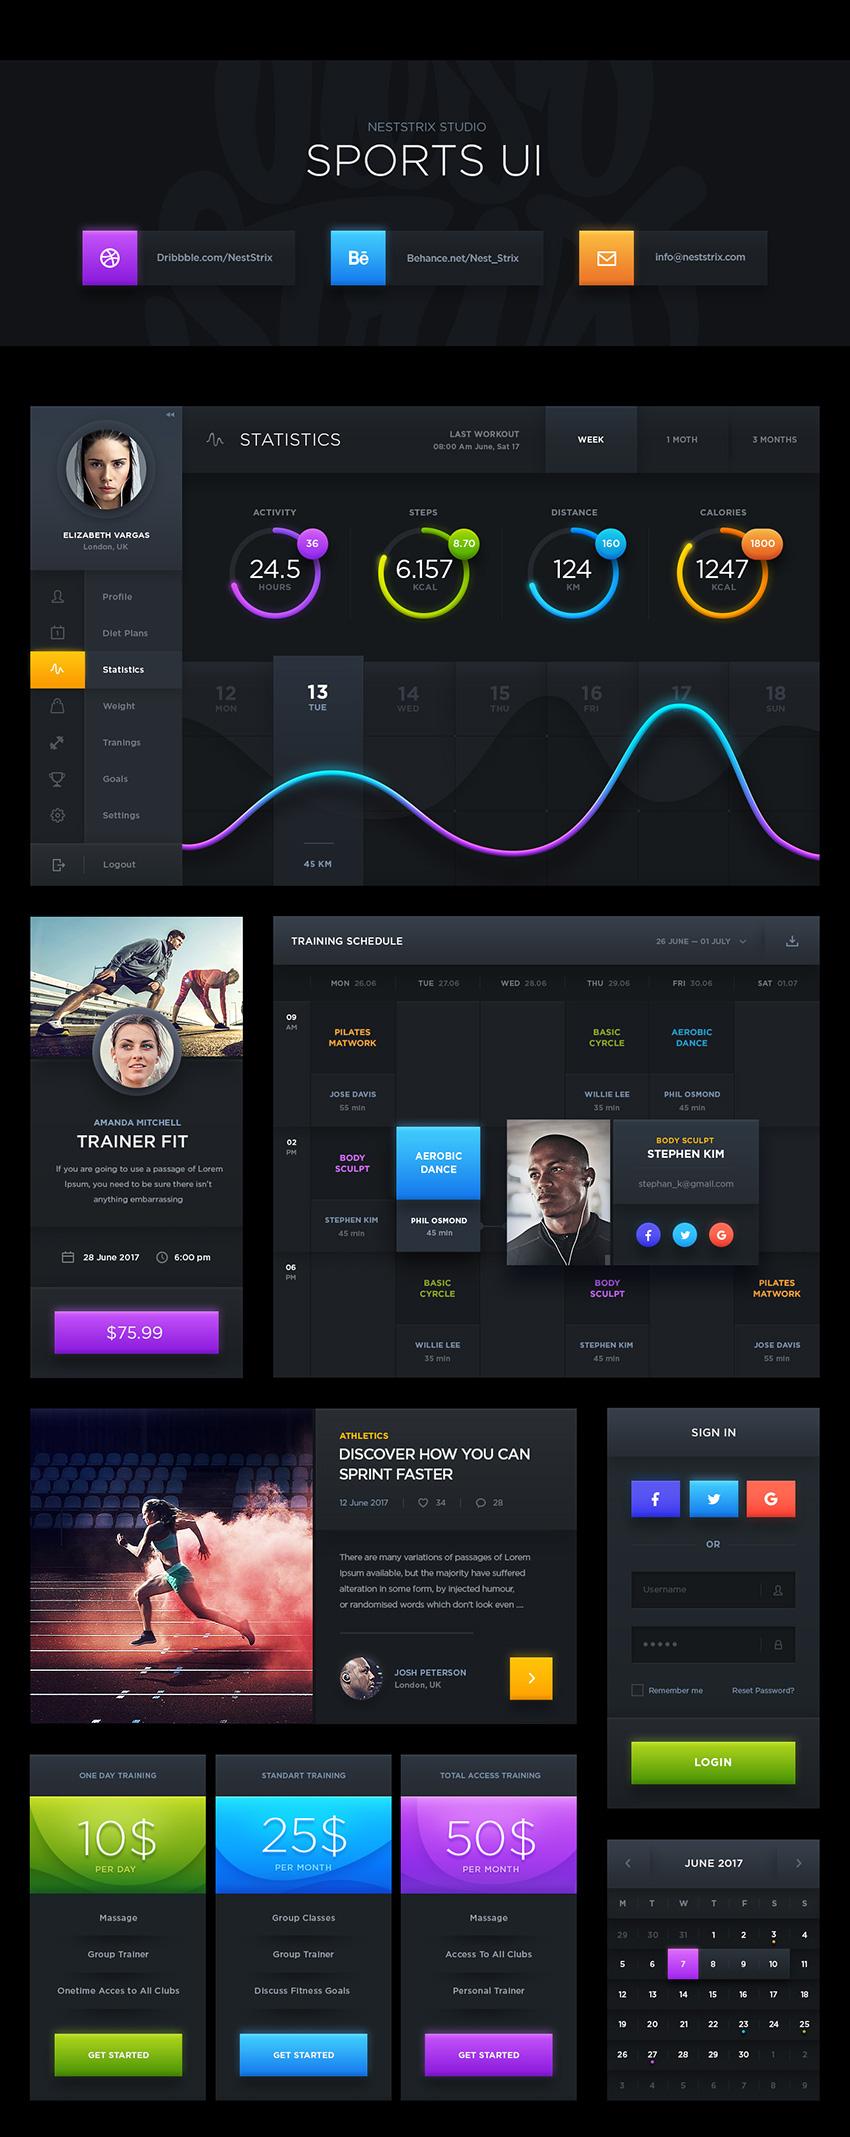 Dark Sports Free UI Kit for Photoshop designers